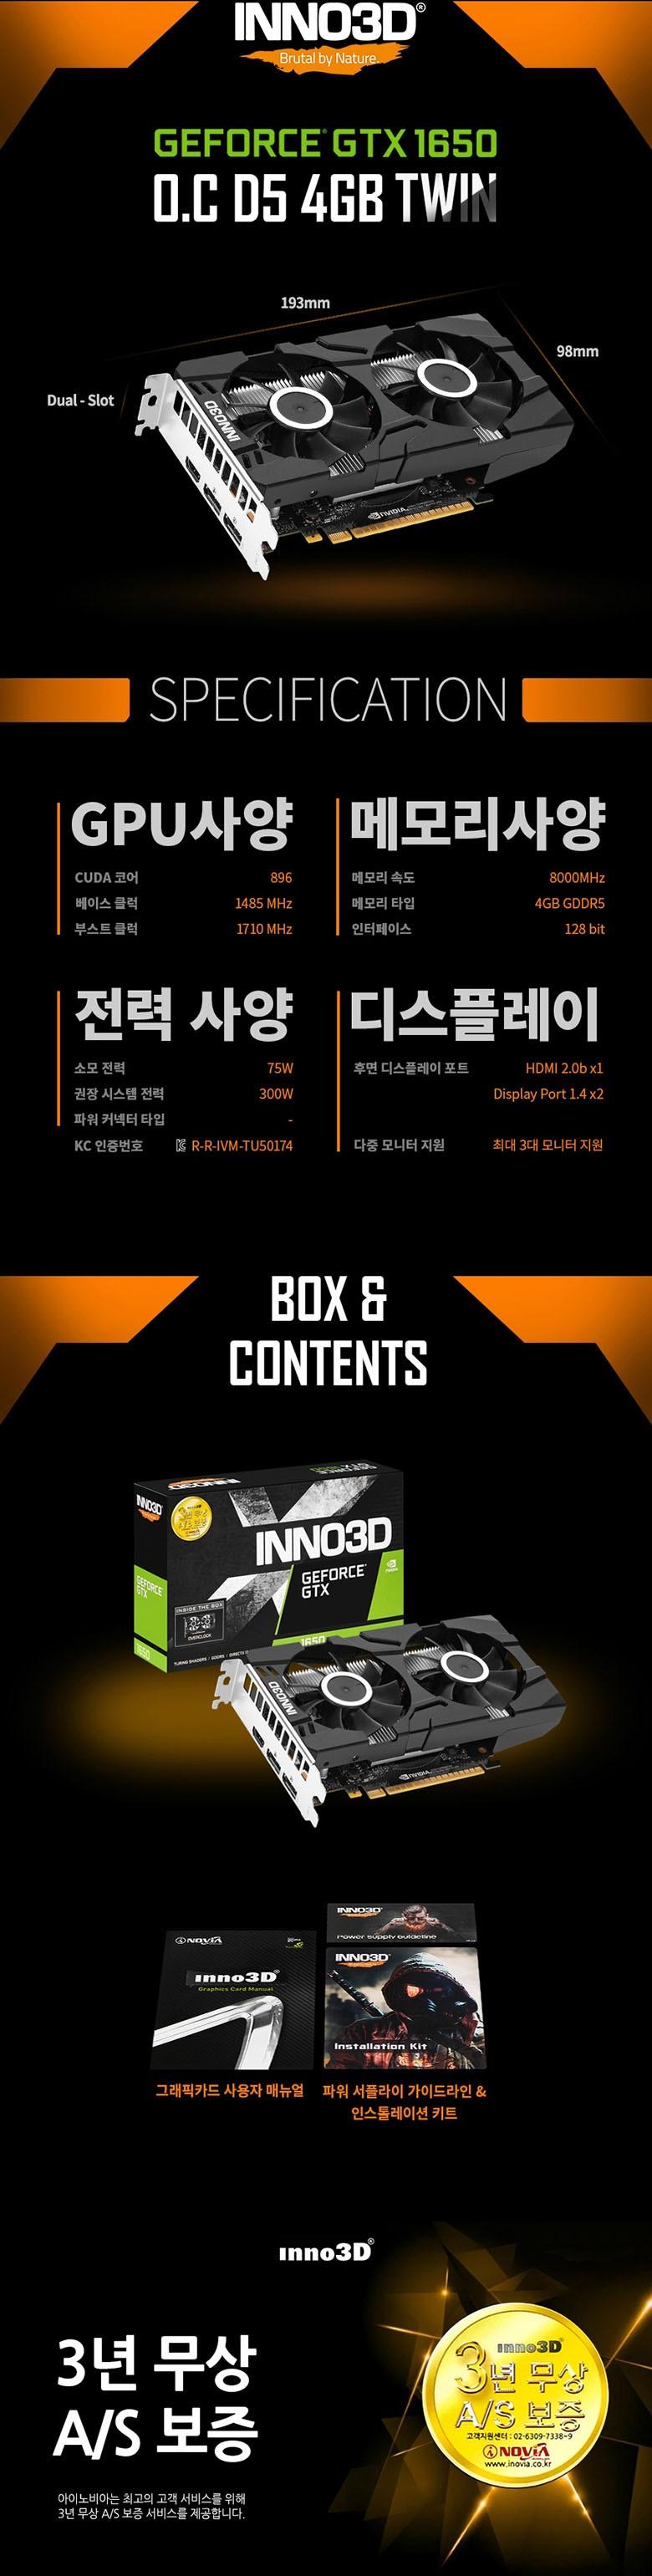 INNO3D GTX 1650 X2 OC 4GB